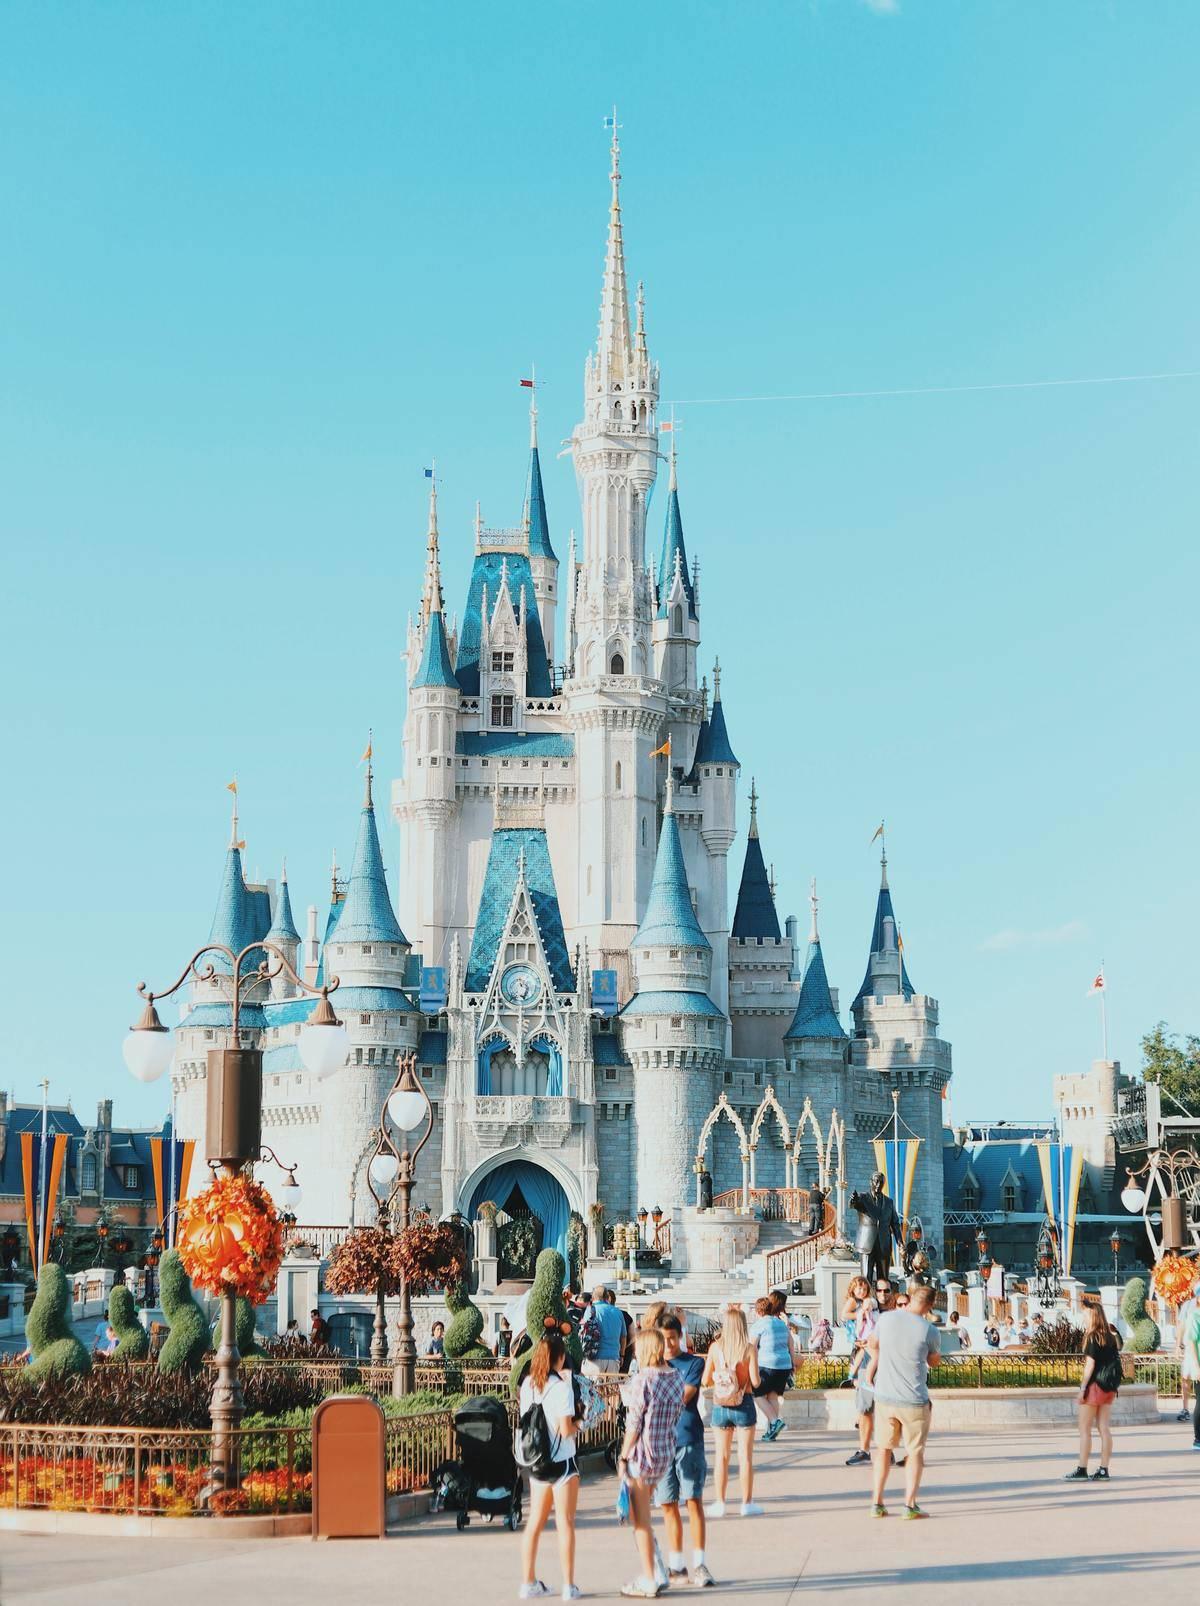 A Walt Disney World castle at the Disney park in Orlando, Florida.